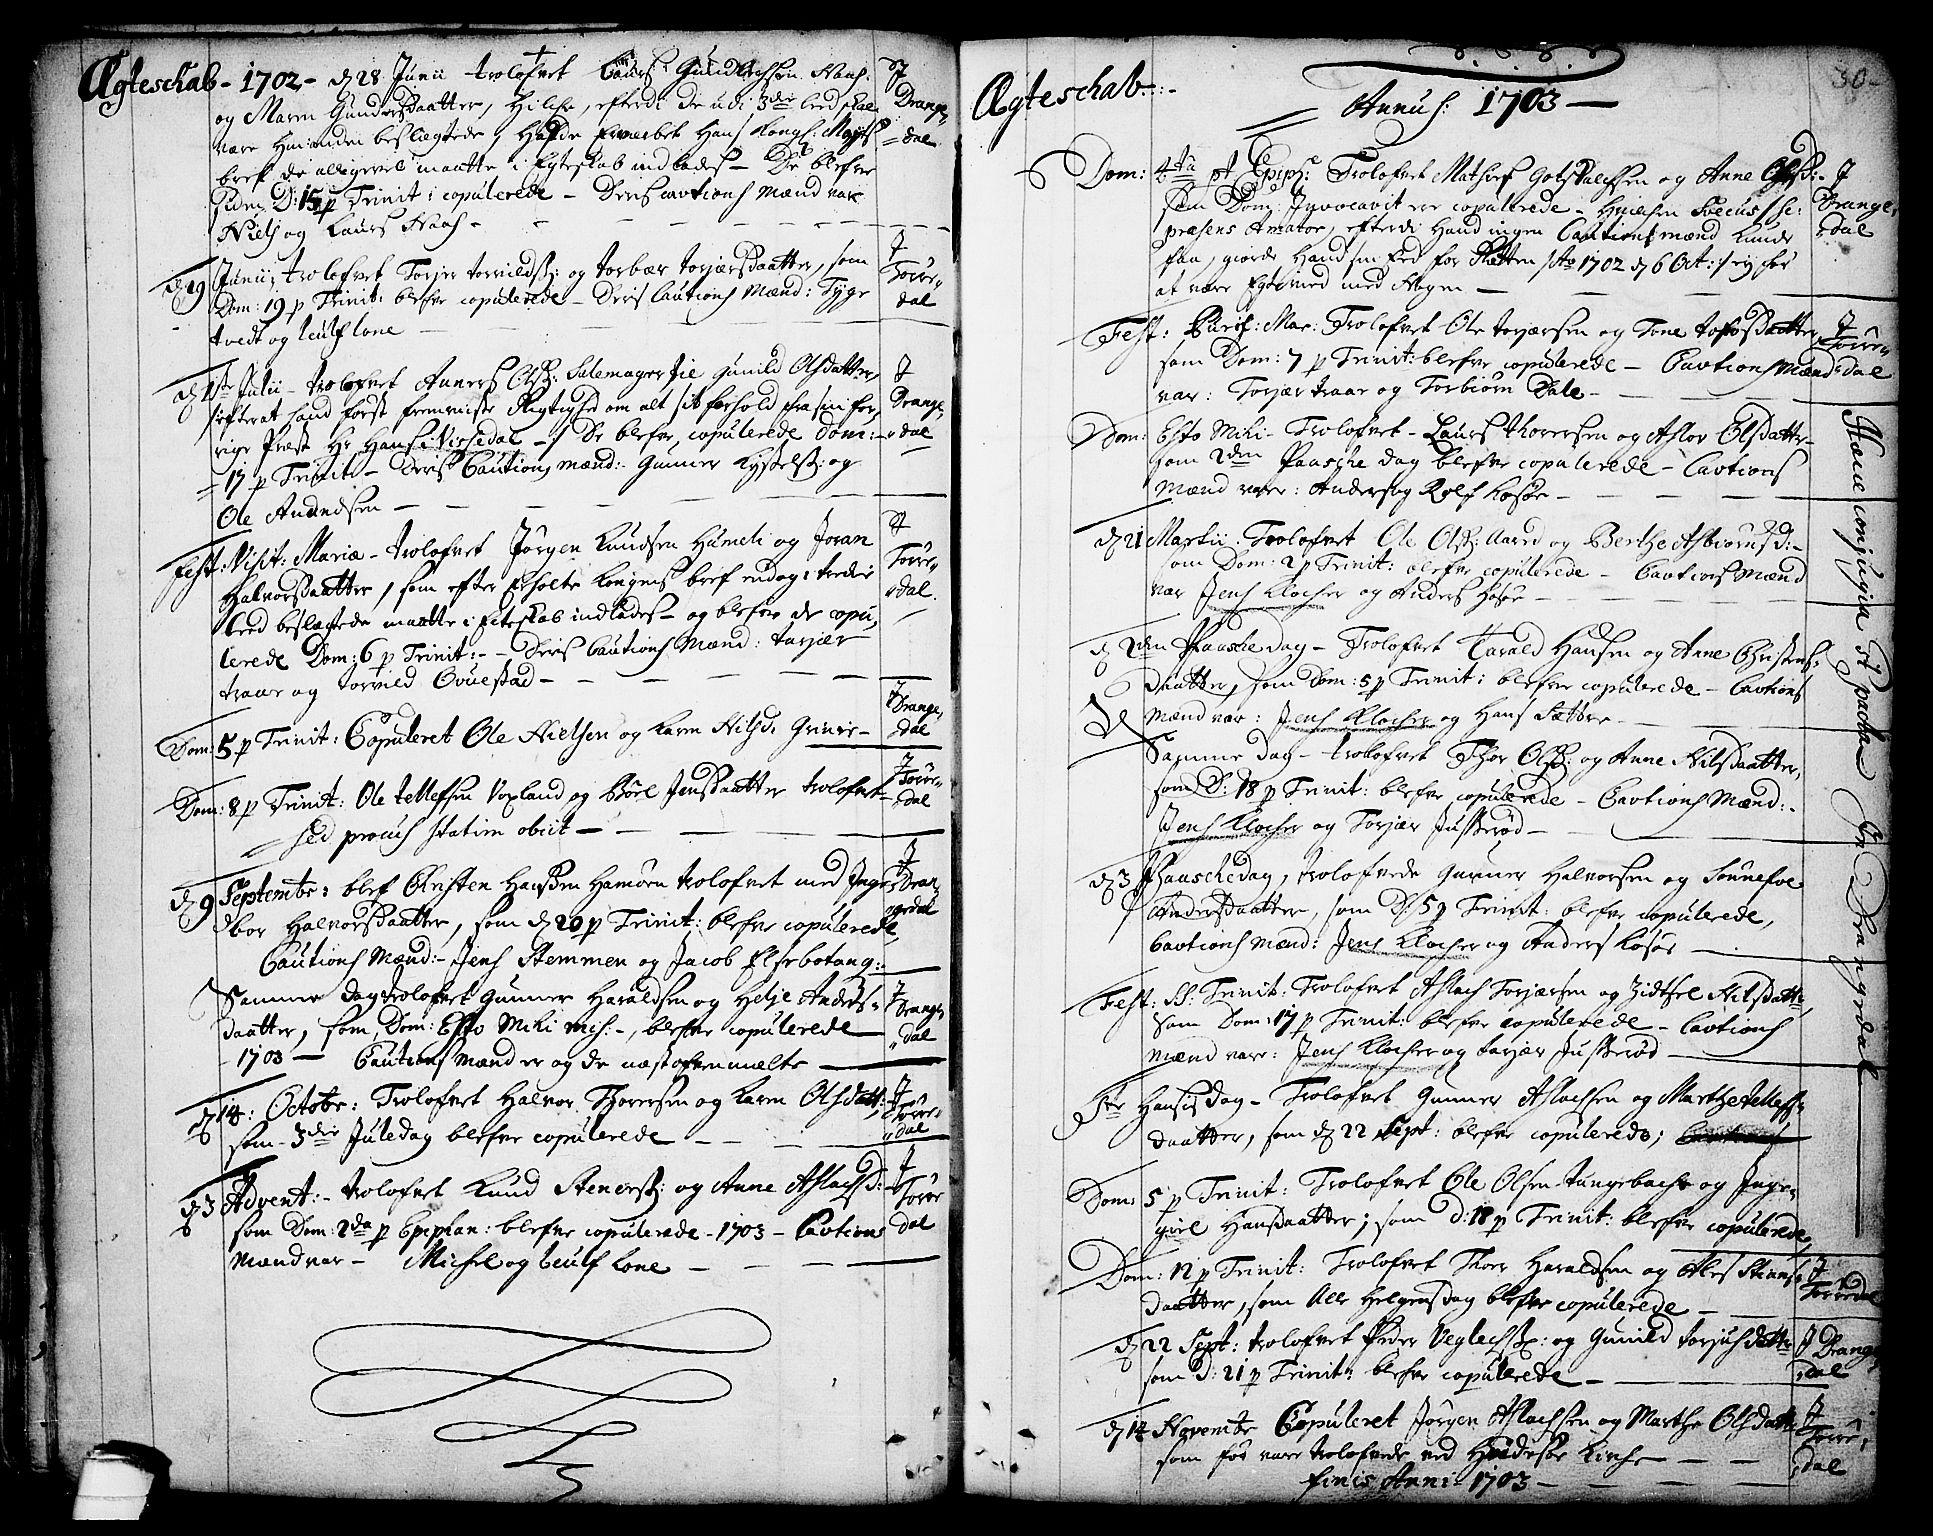 SAKO, Drangedal kirkebøker, F/Fa/L0001: Ministerialbok nr. 1, 1697-1767, s. 30